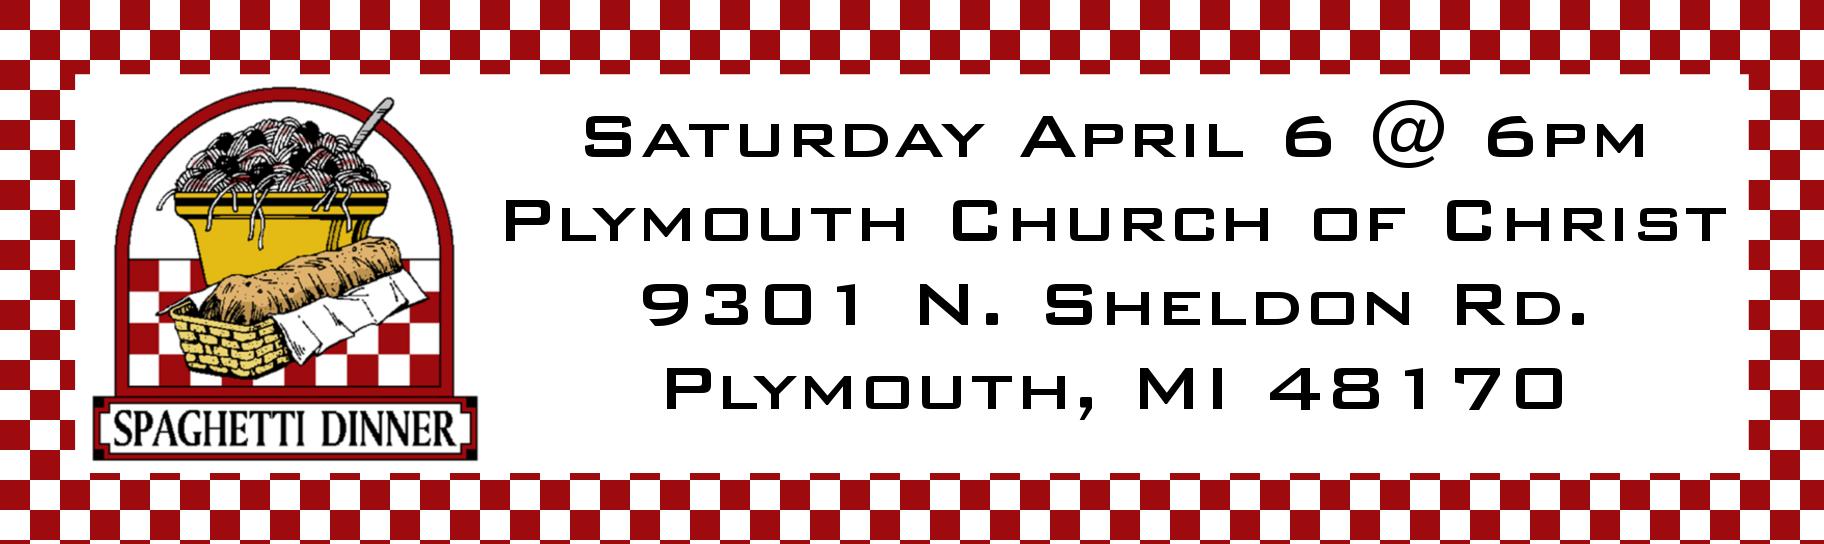 printable fundraiser tickets